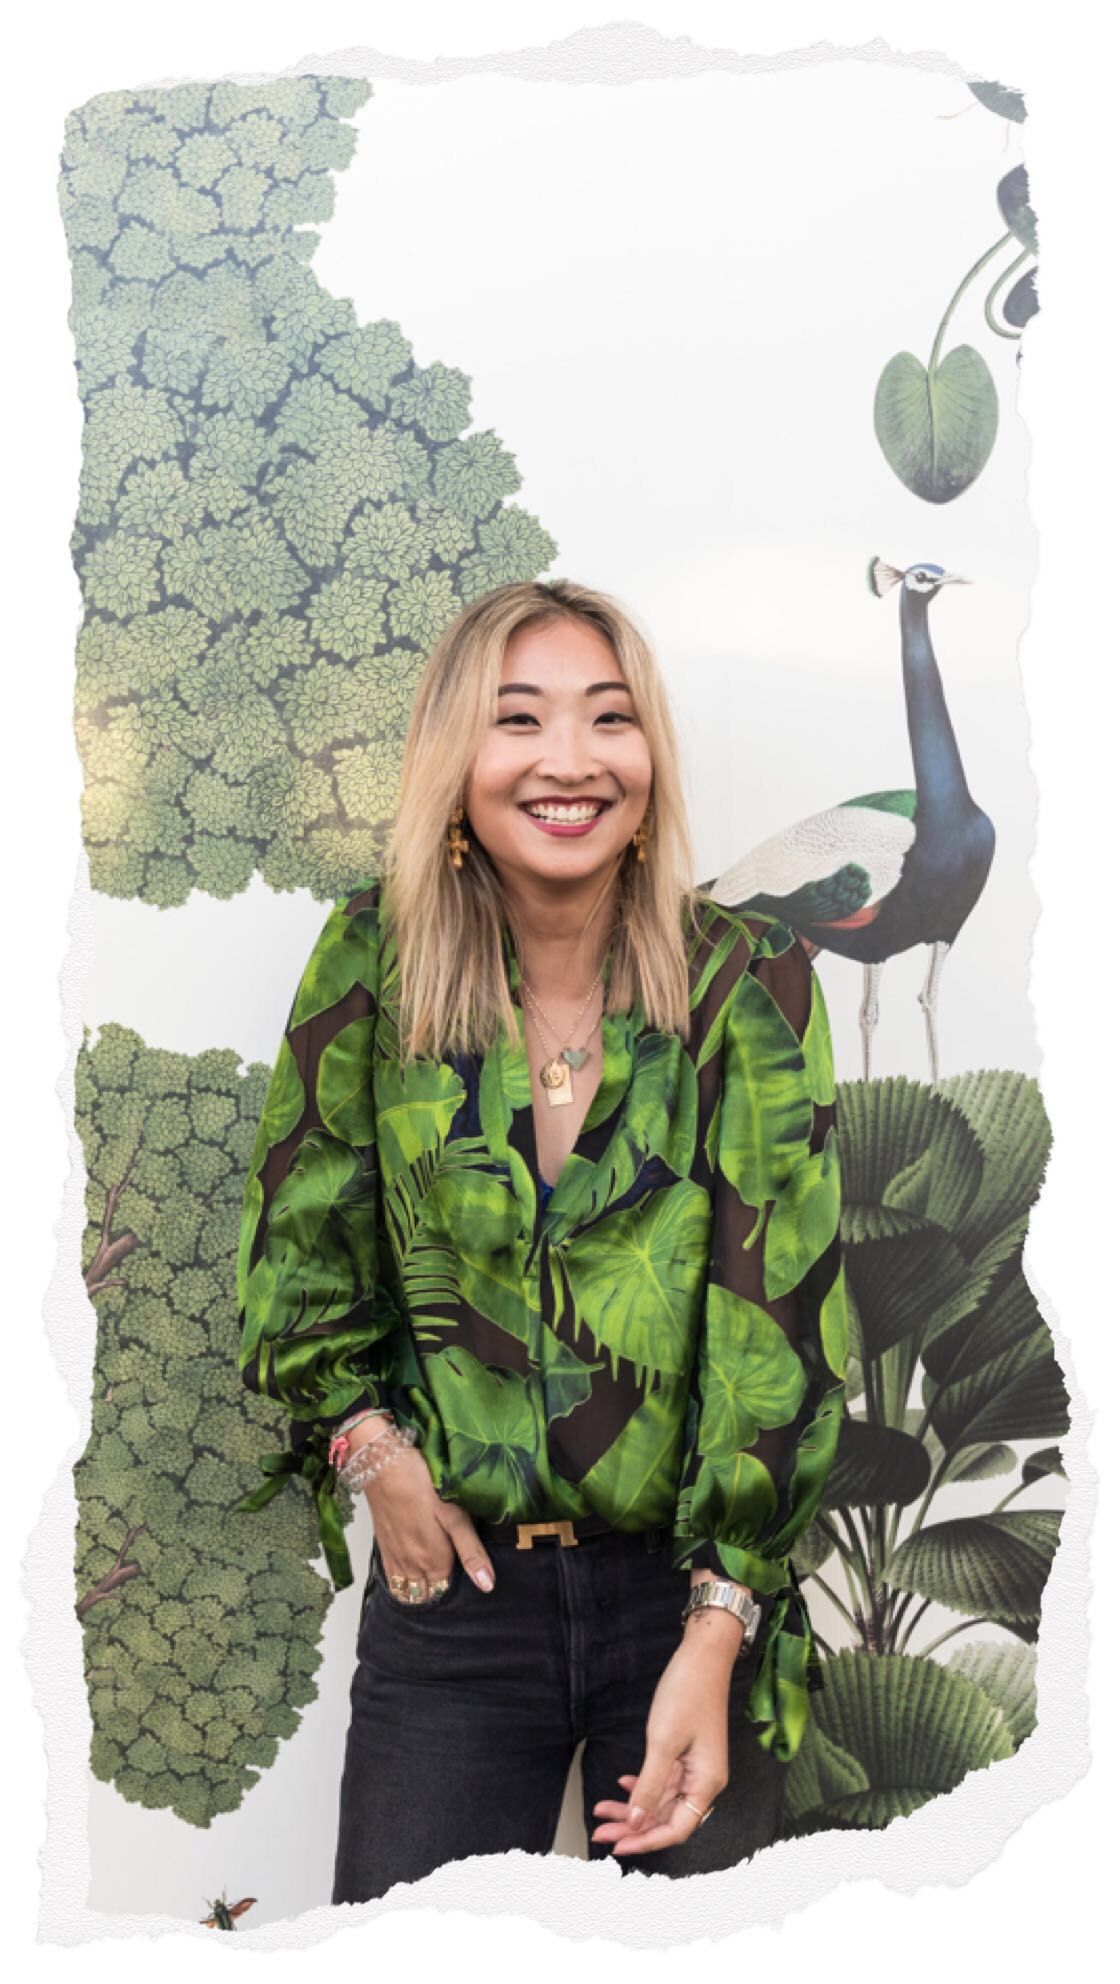 Shopbop x Botanica Dinner, Helen Chik